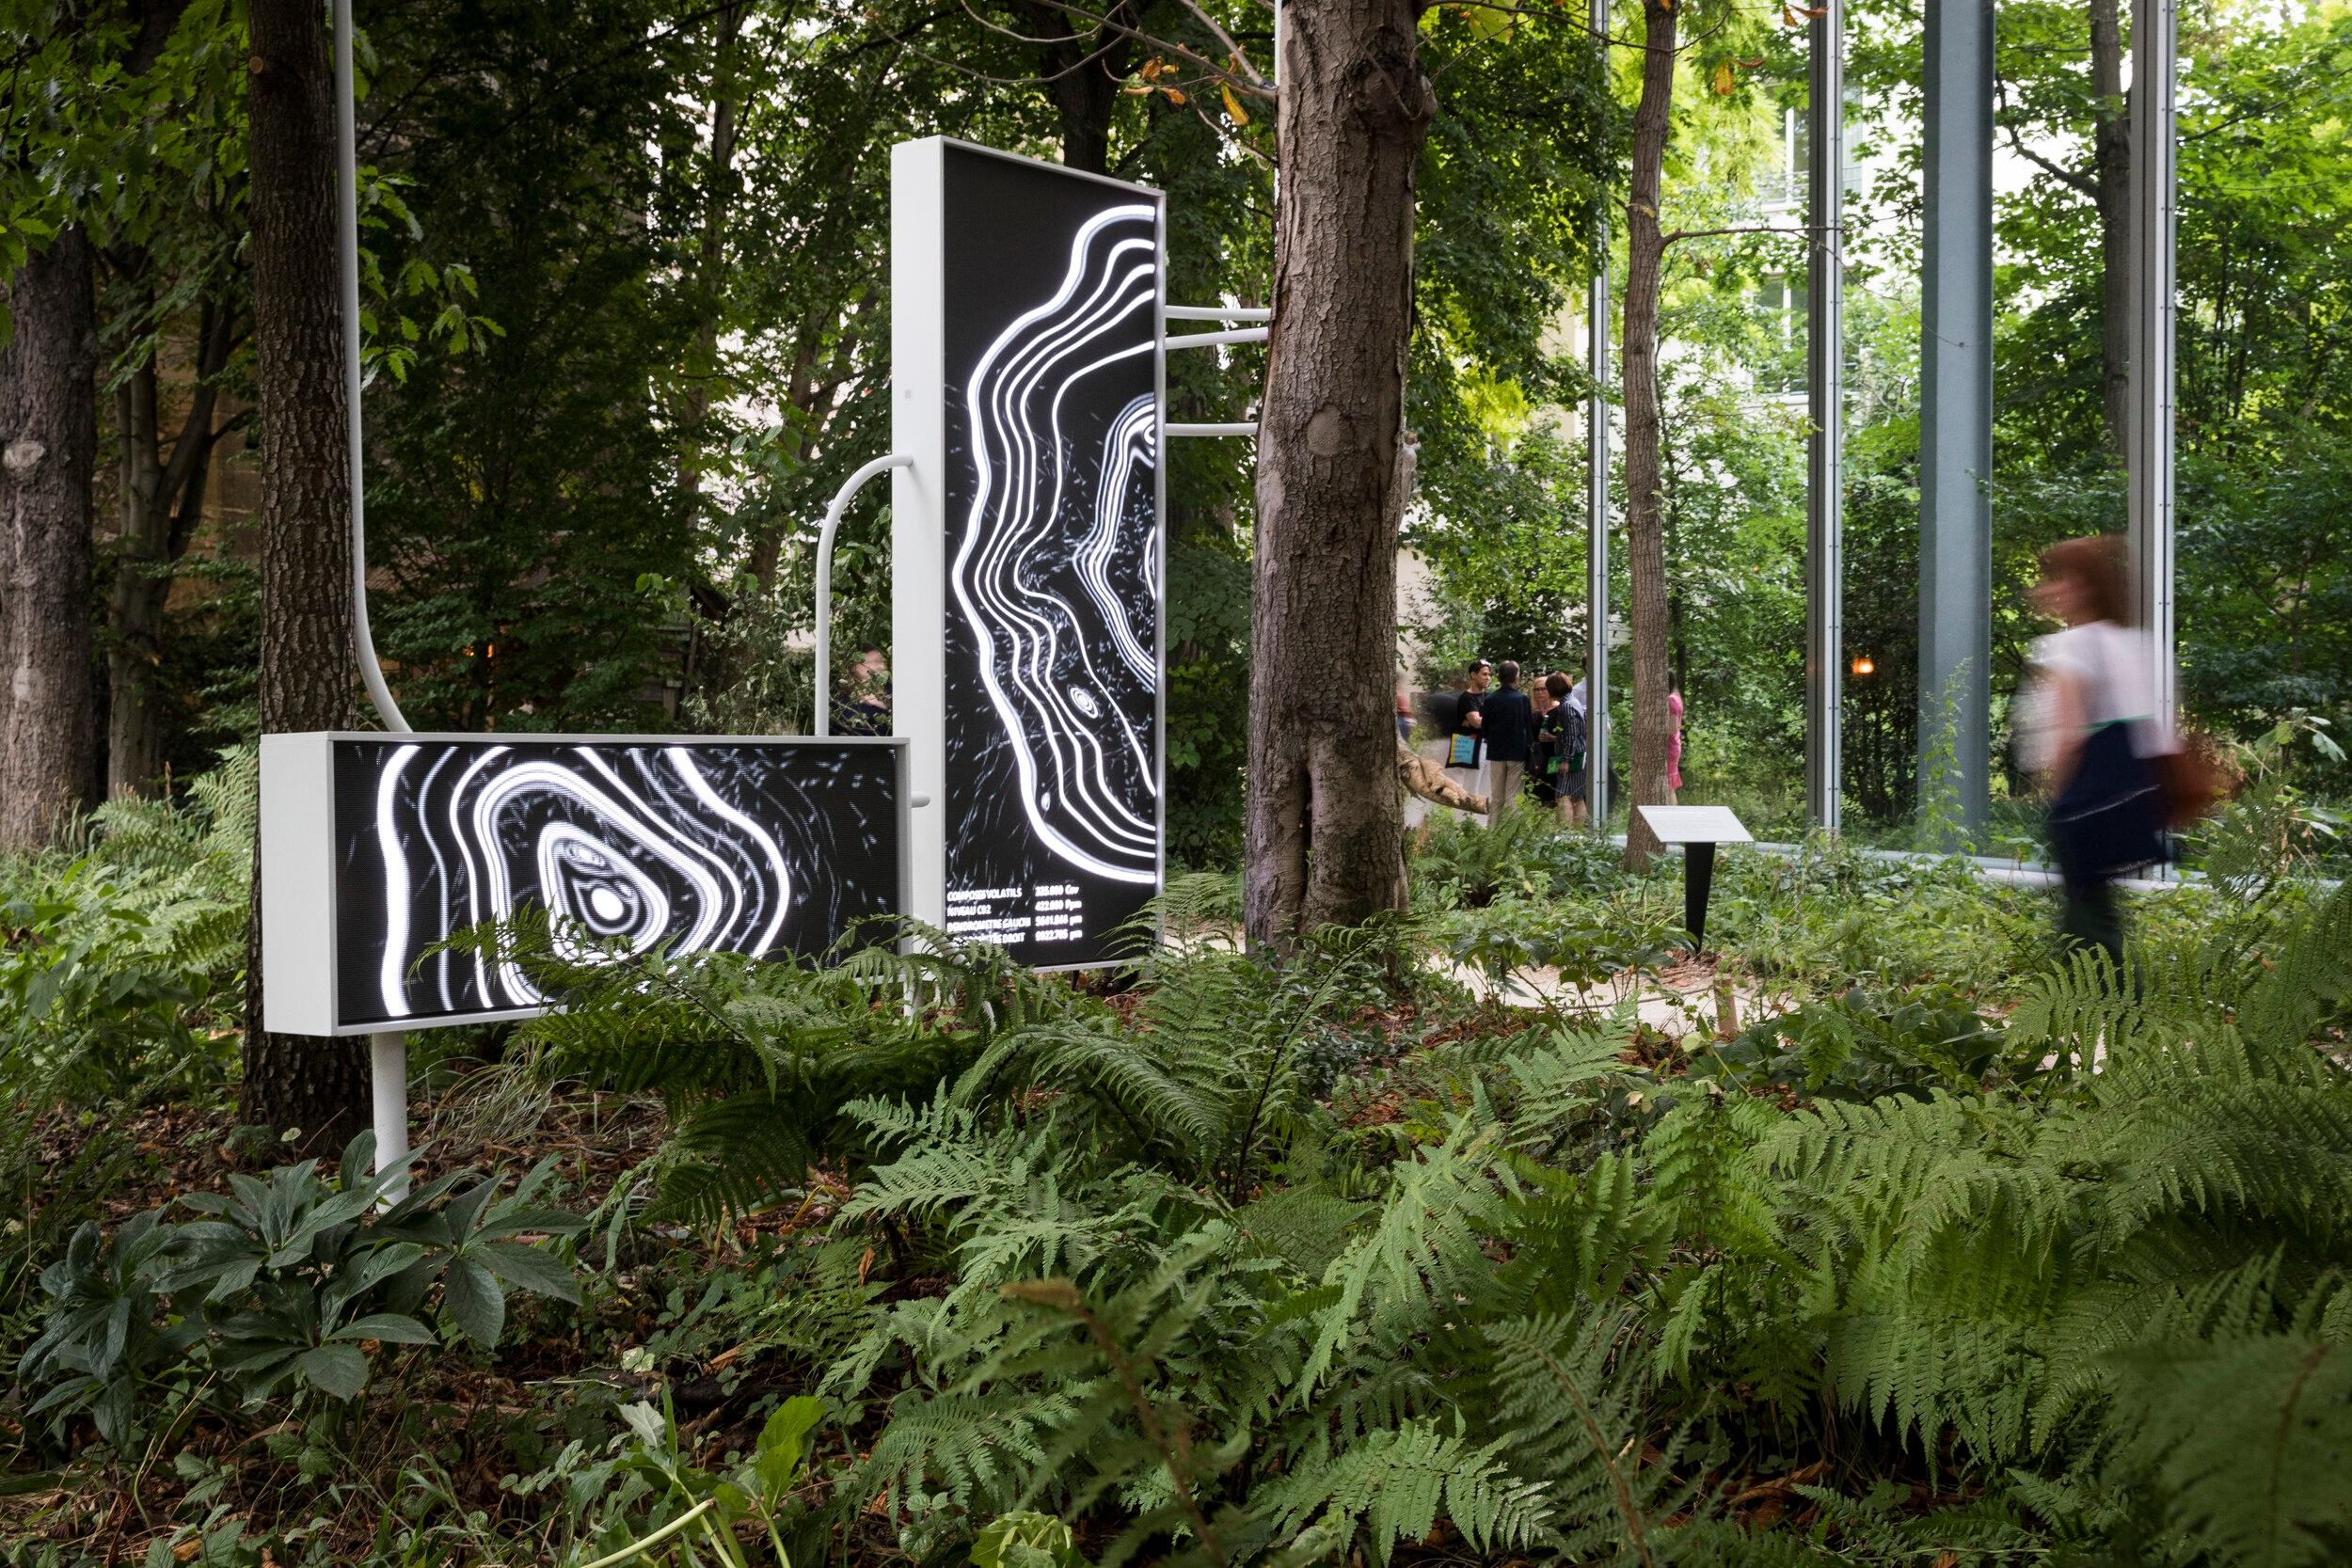 symbiosia_Cartier_thijs_biersteker_stefano_mancuso_Tree_art_Sensors